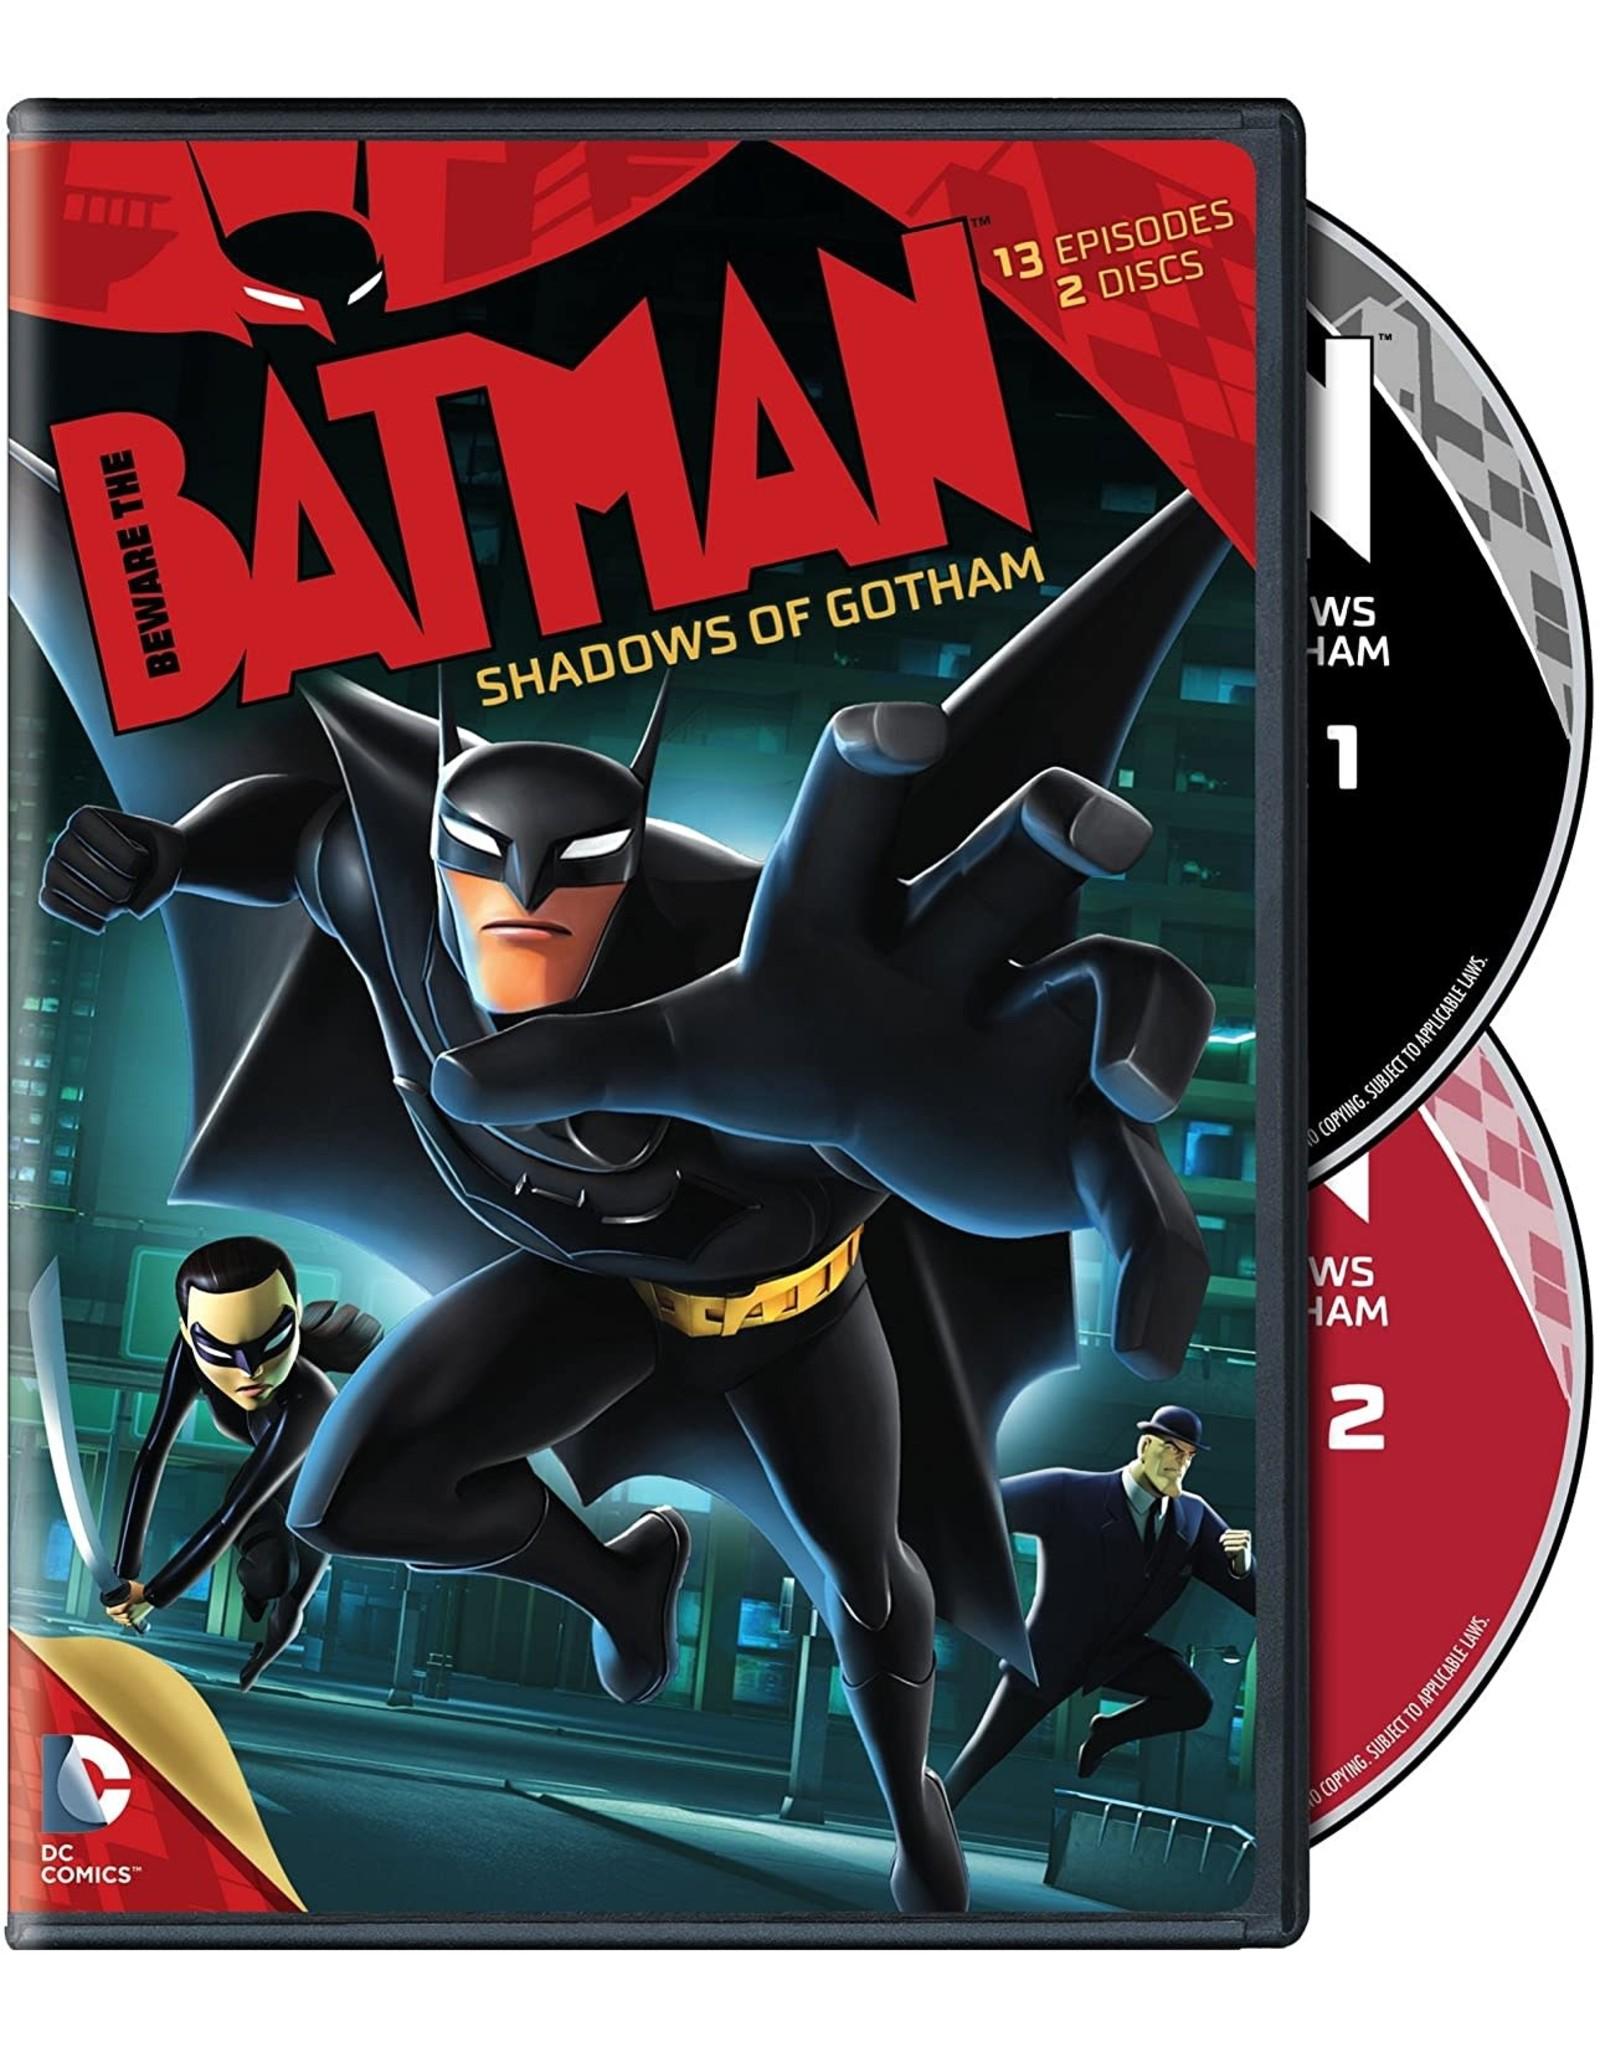 Animated Beware the Batman - Shadows of Gotham